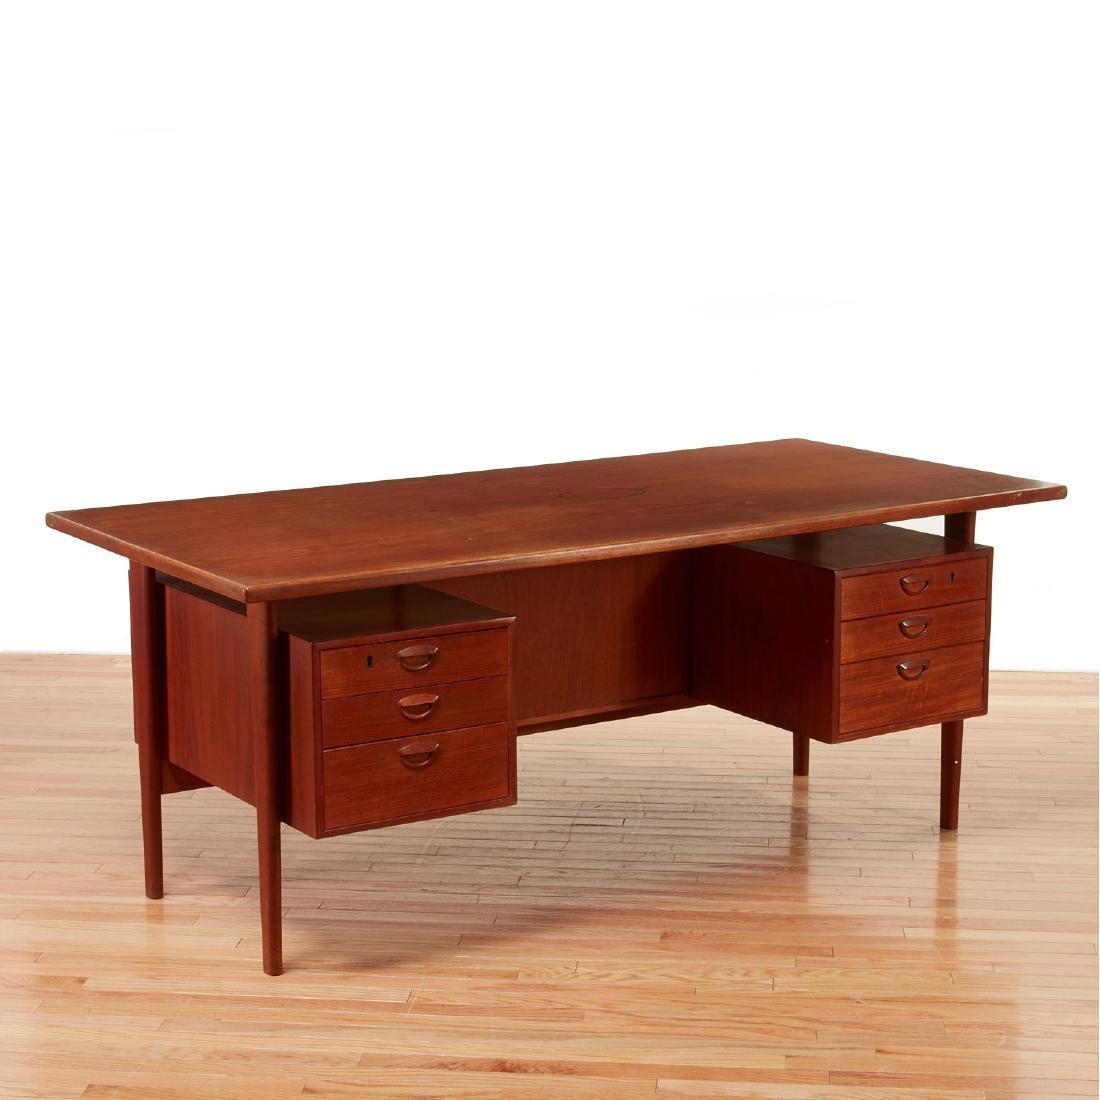 Kai Kristiansen Danish Modern desk